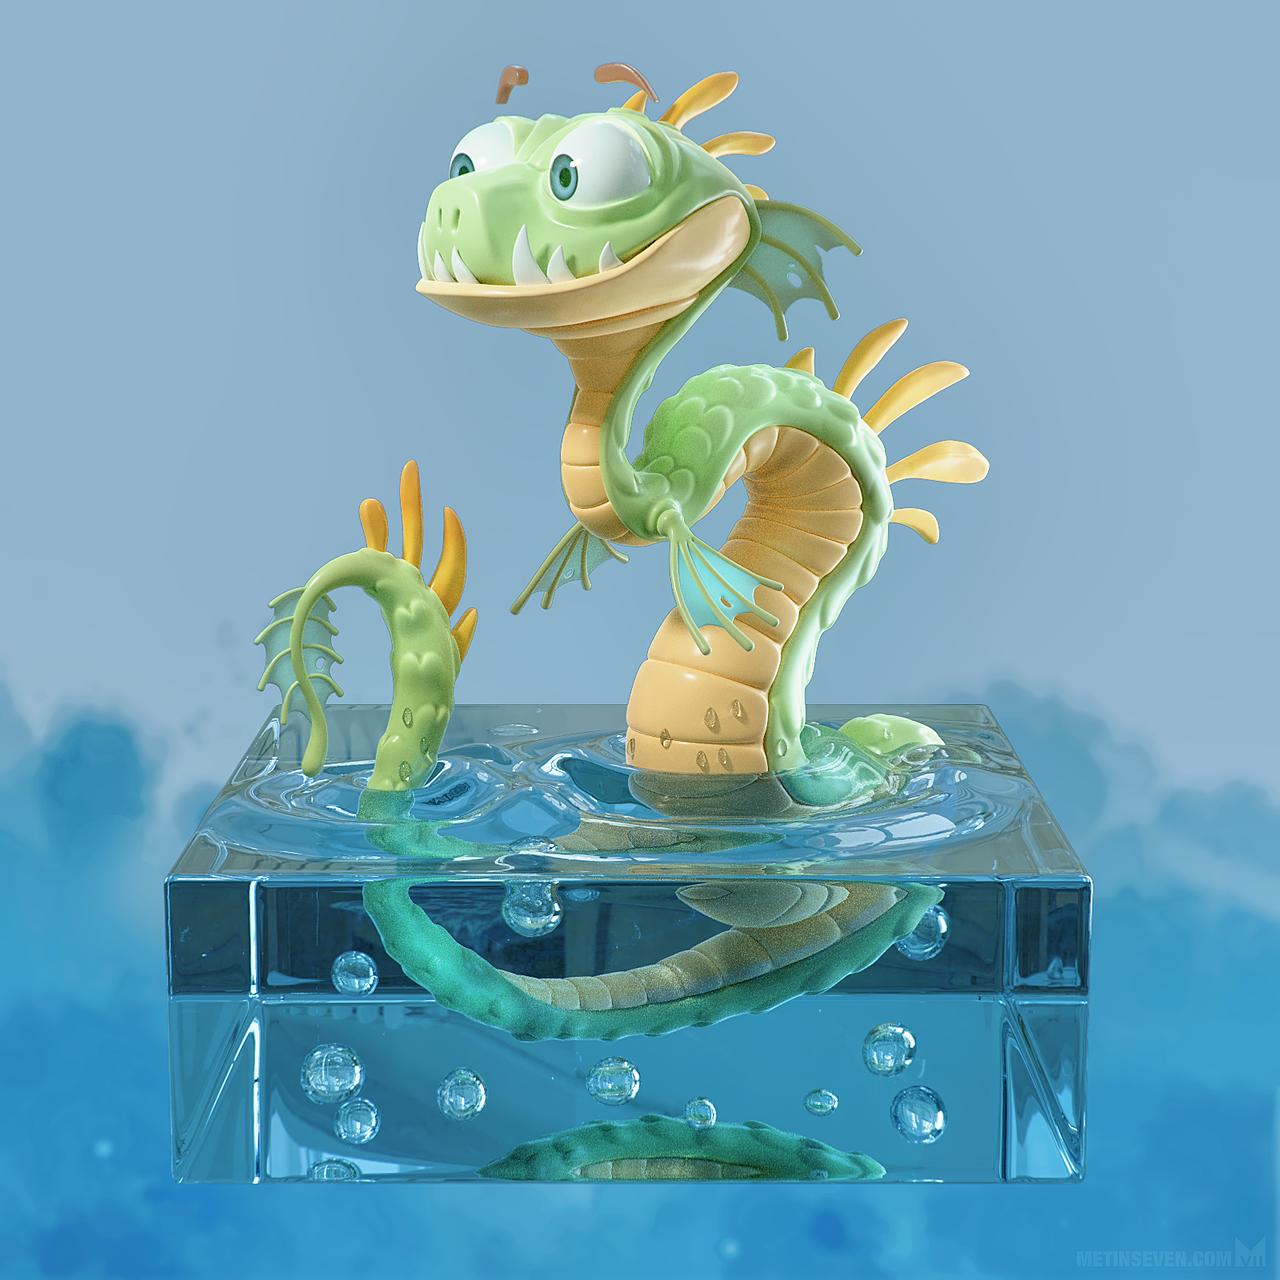 r-dragon-monster.png